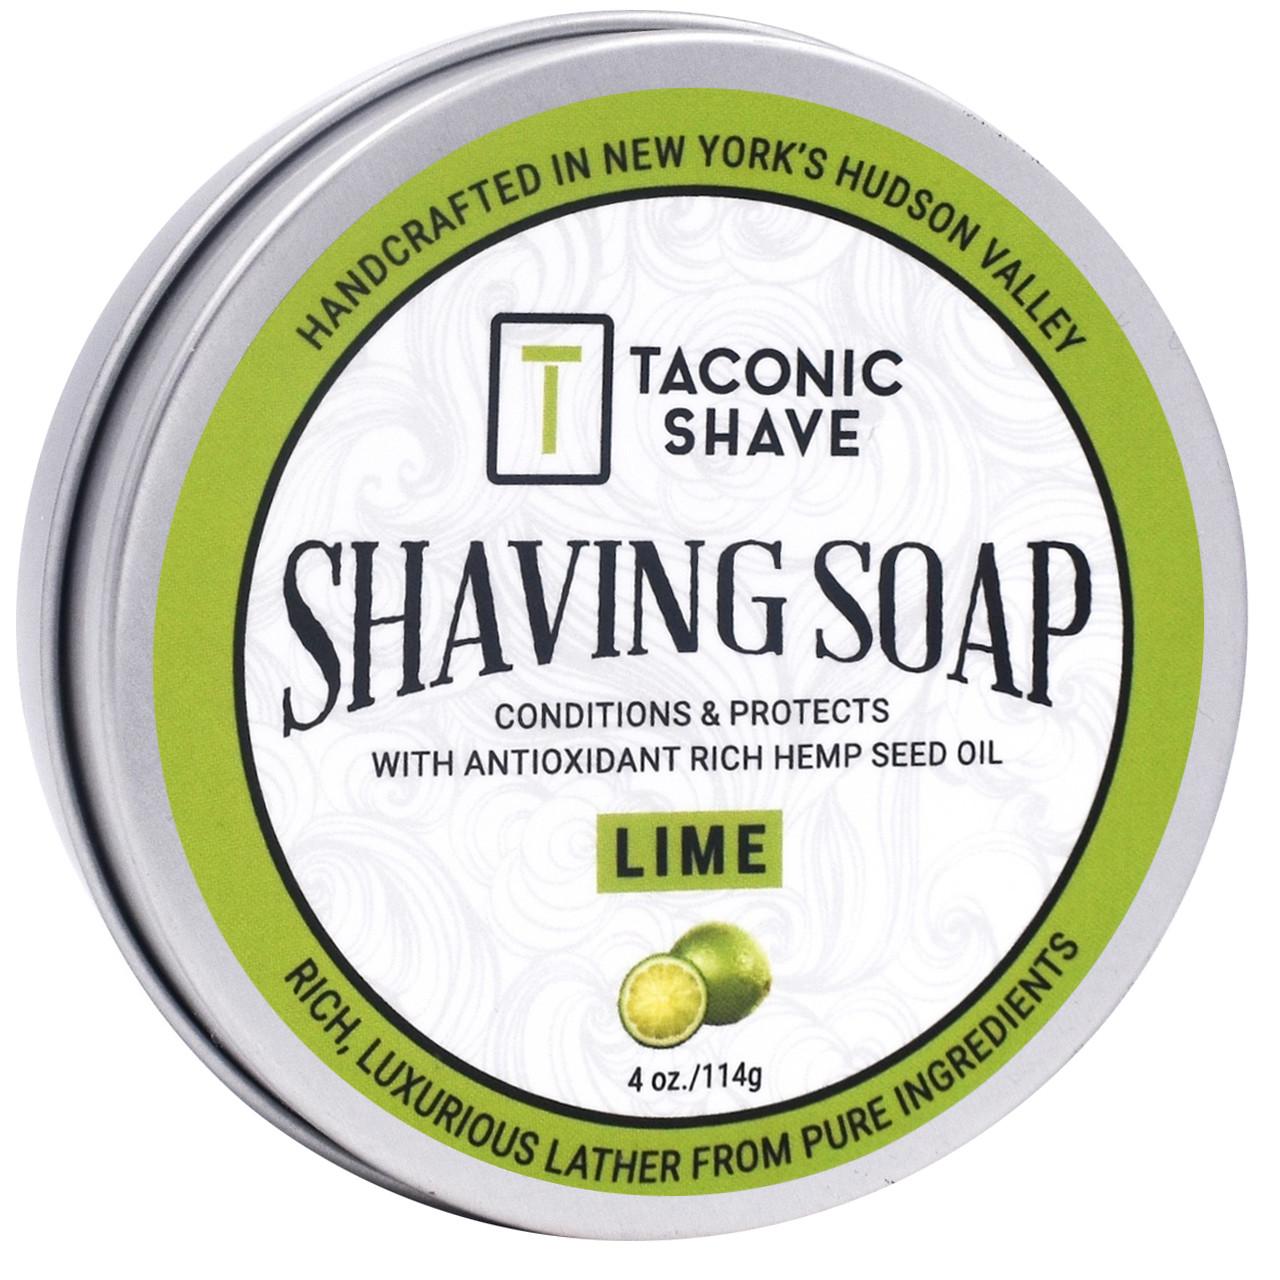 Taconic Shave Soap Lime 4oz